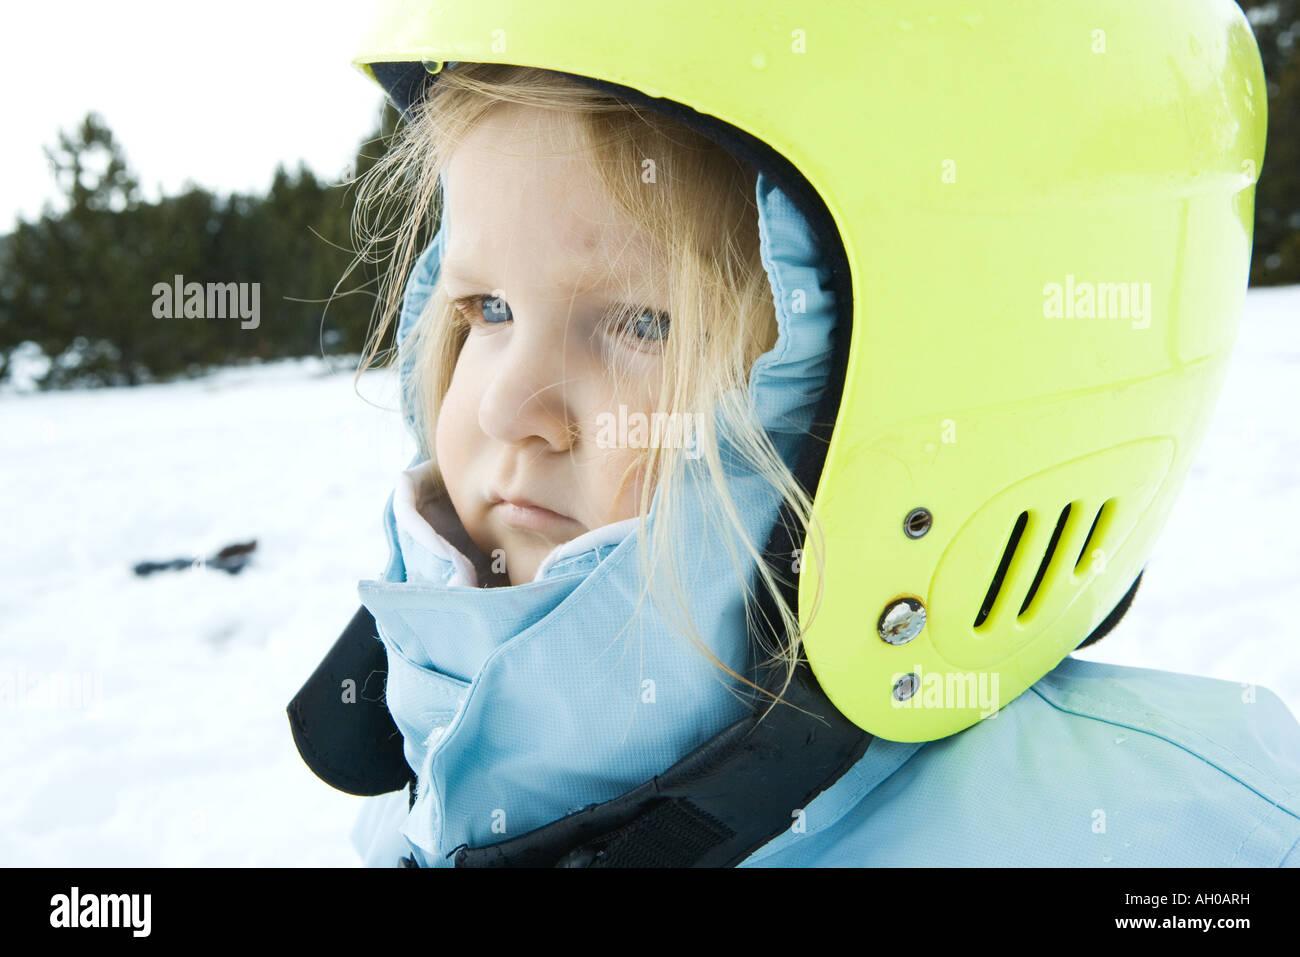 Toddler girl wearing winter coat and helmet, in snowy landscape, portrait - Stock Image